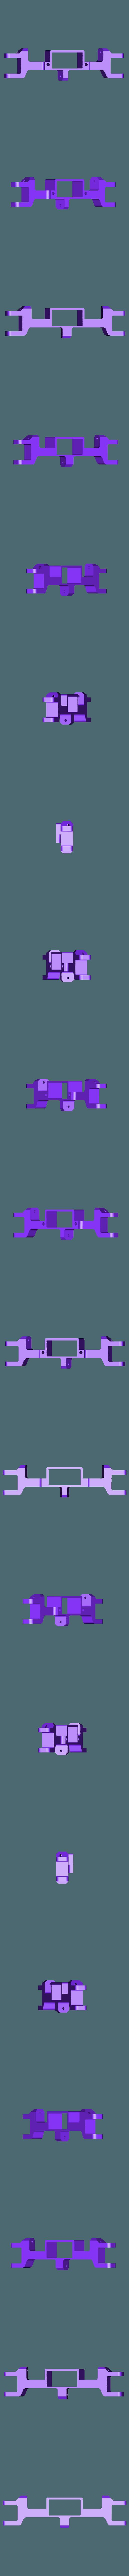 Beamaxle_servo.STL Download free STL file Printed truck V2: Front axle • 3D printable design, MrCrankyface